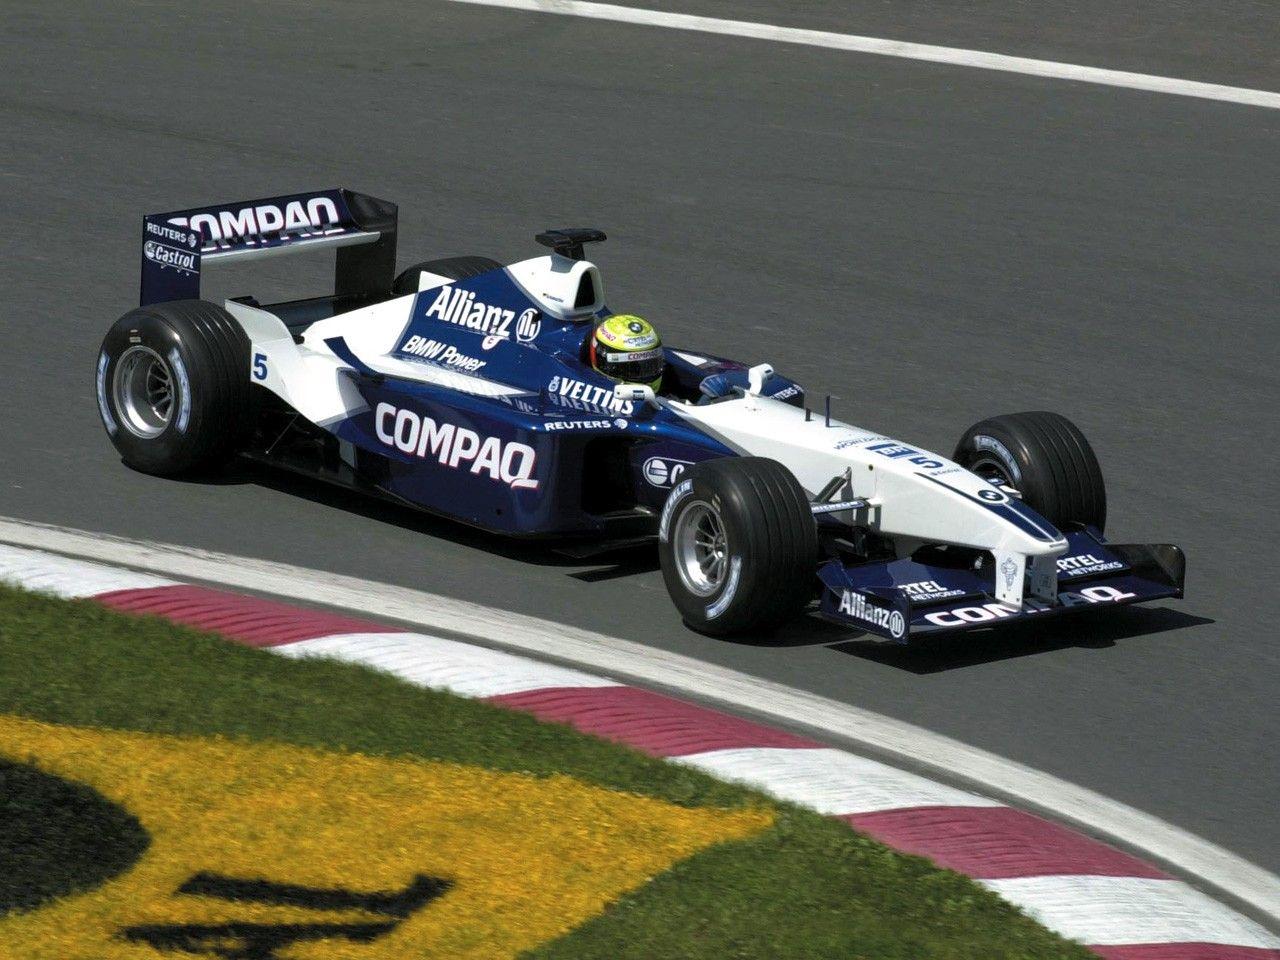 2001 Williams FW23  BMW Ralf Schumacher  2001 Formua